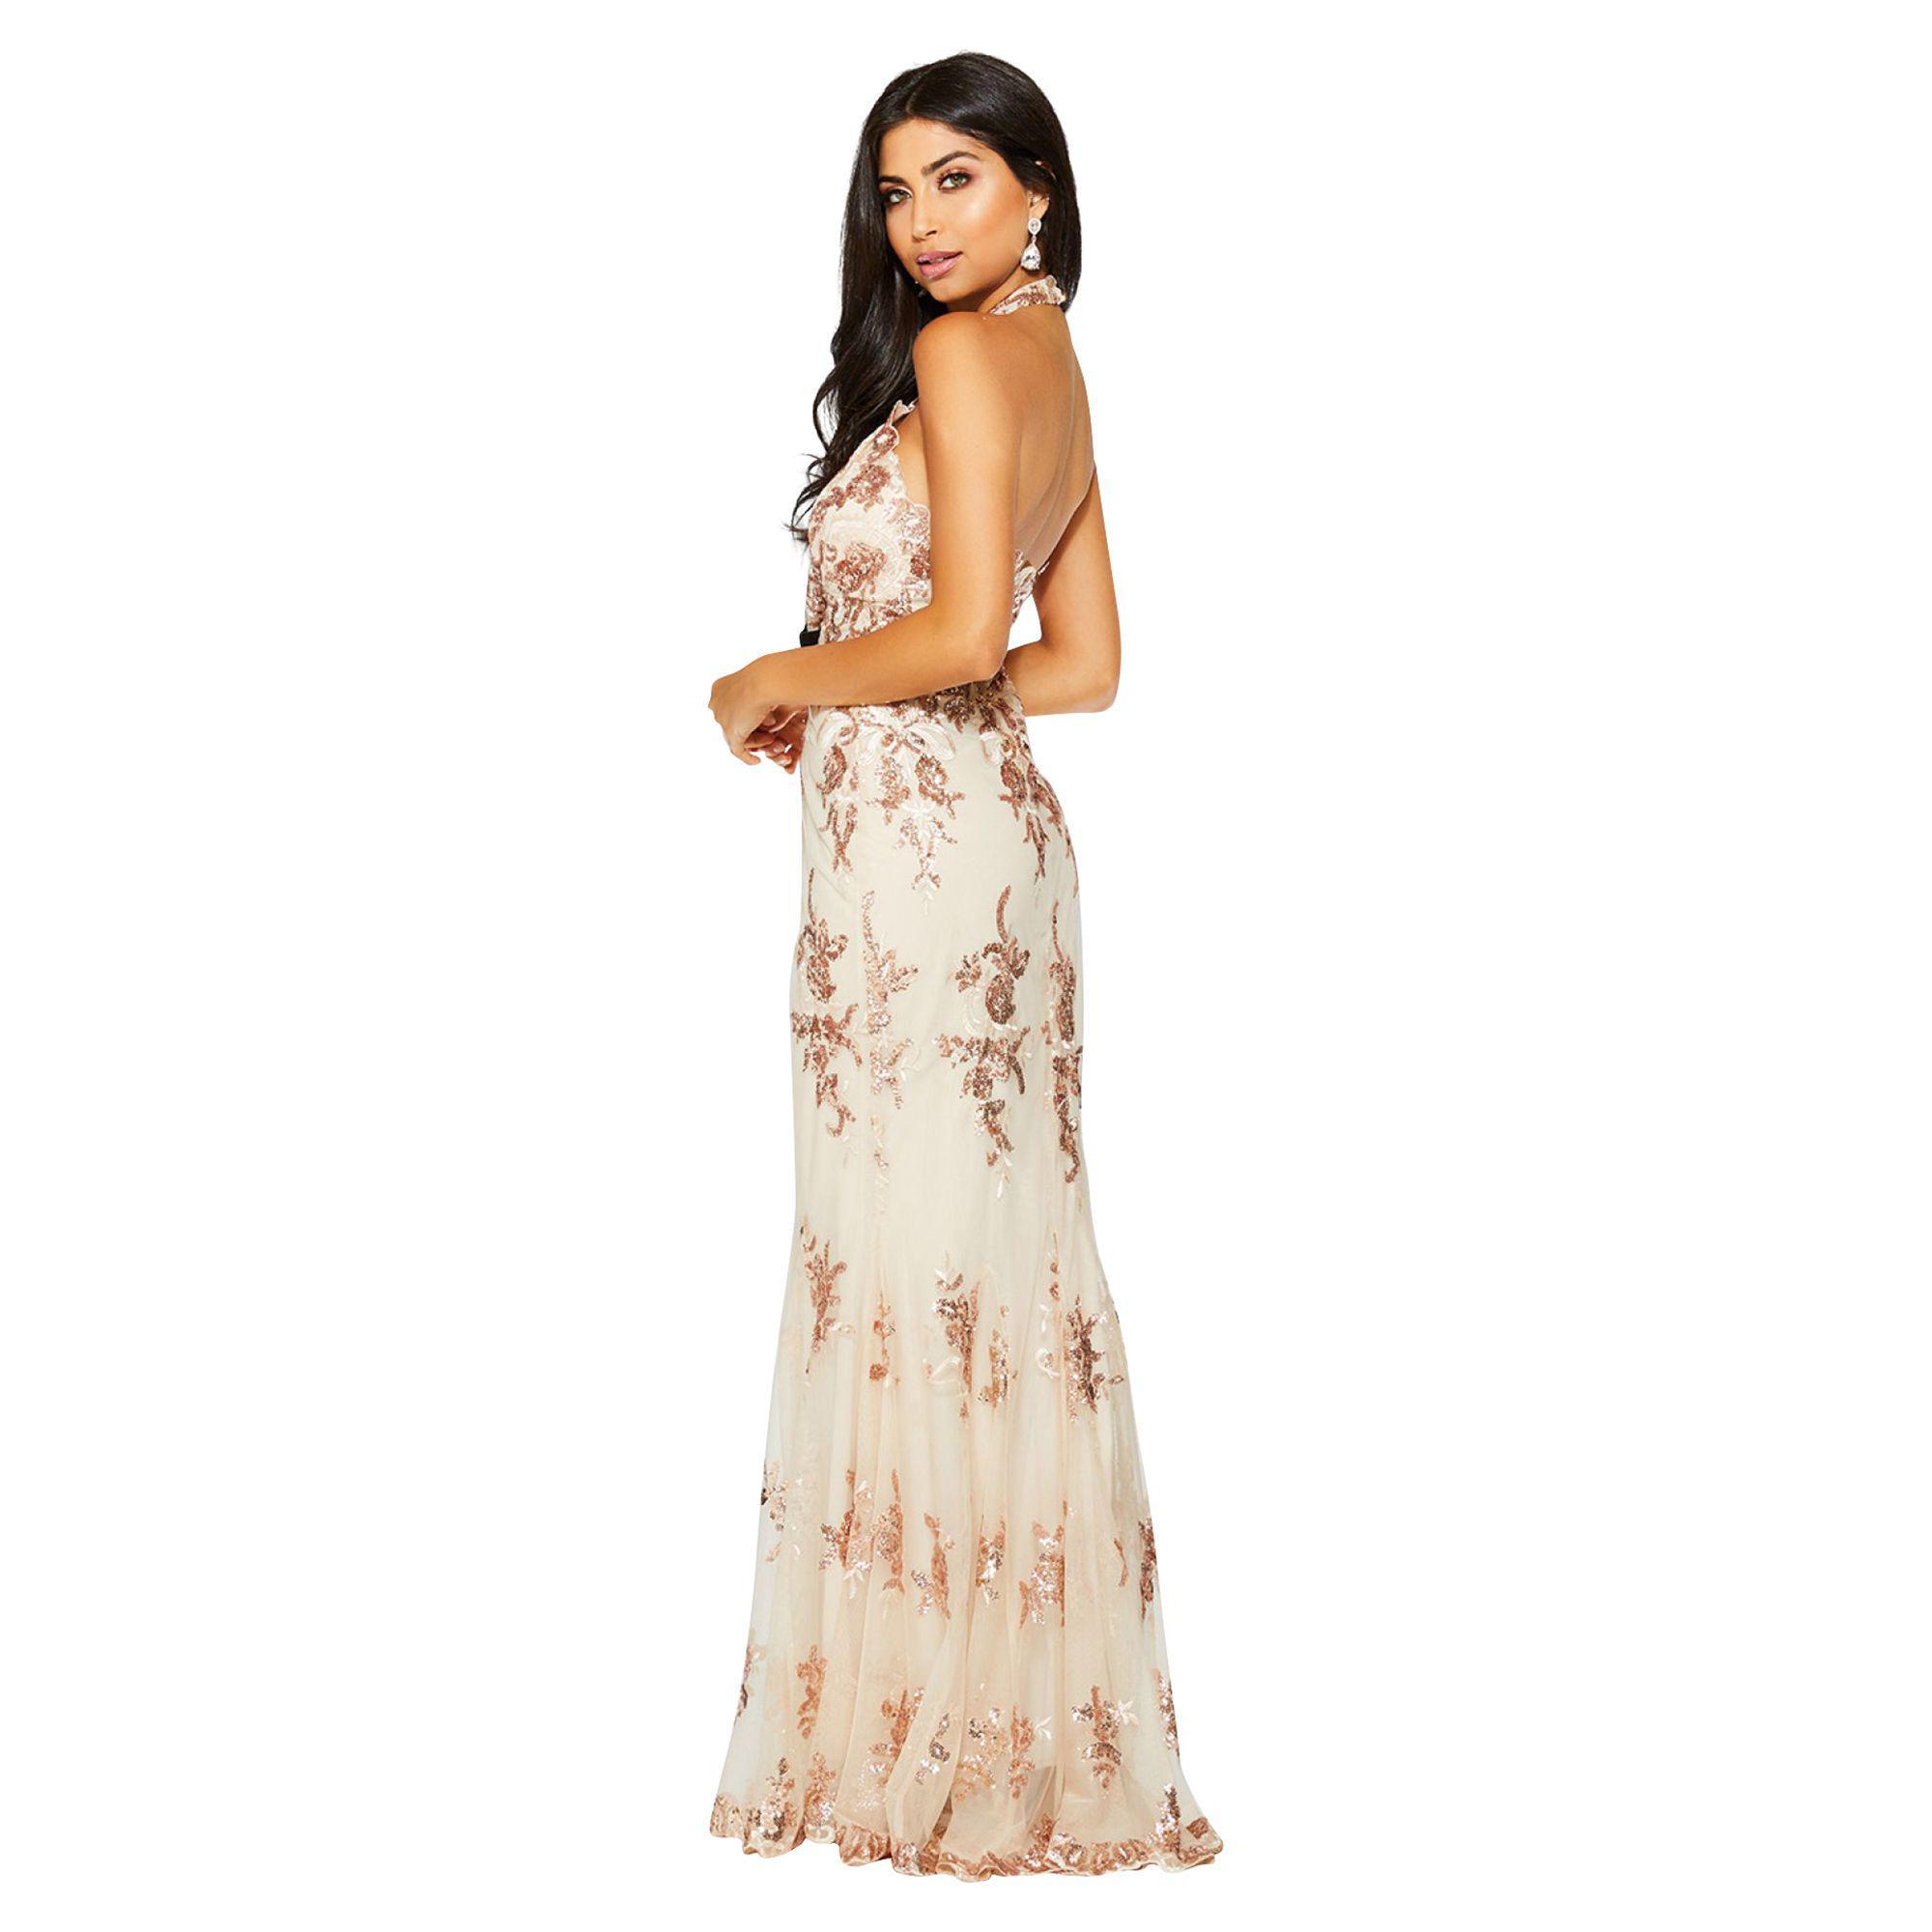 41b9c6cb6983 Quiz Rose Gold Chiffon Sequin Cut Out Maxi Dress in Metallic - Lyst